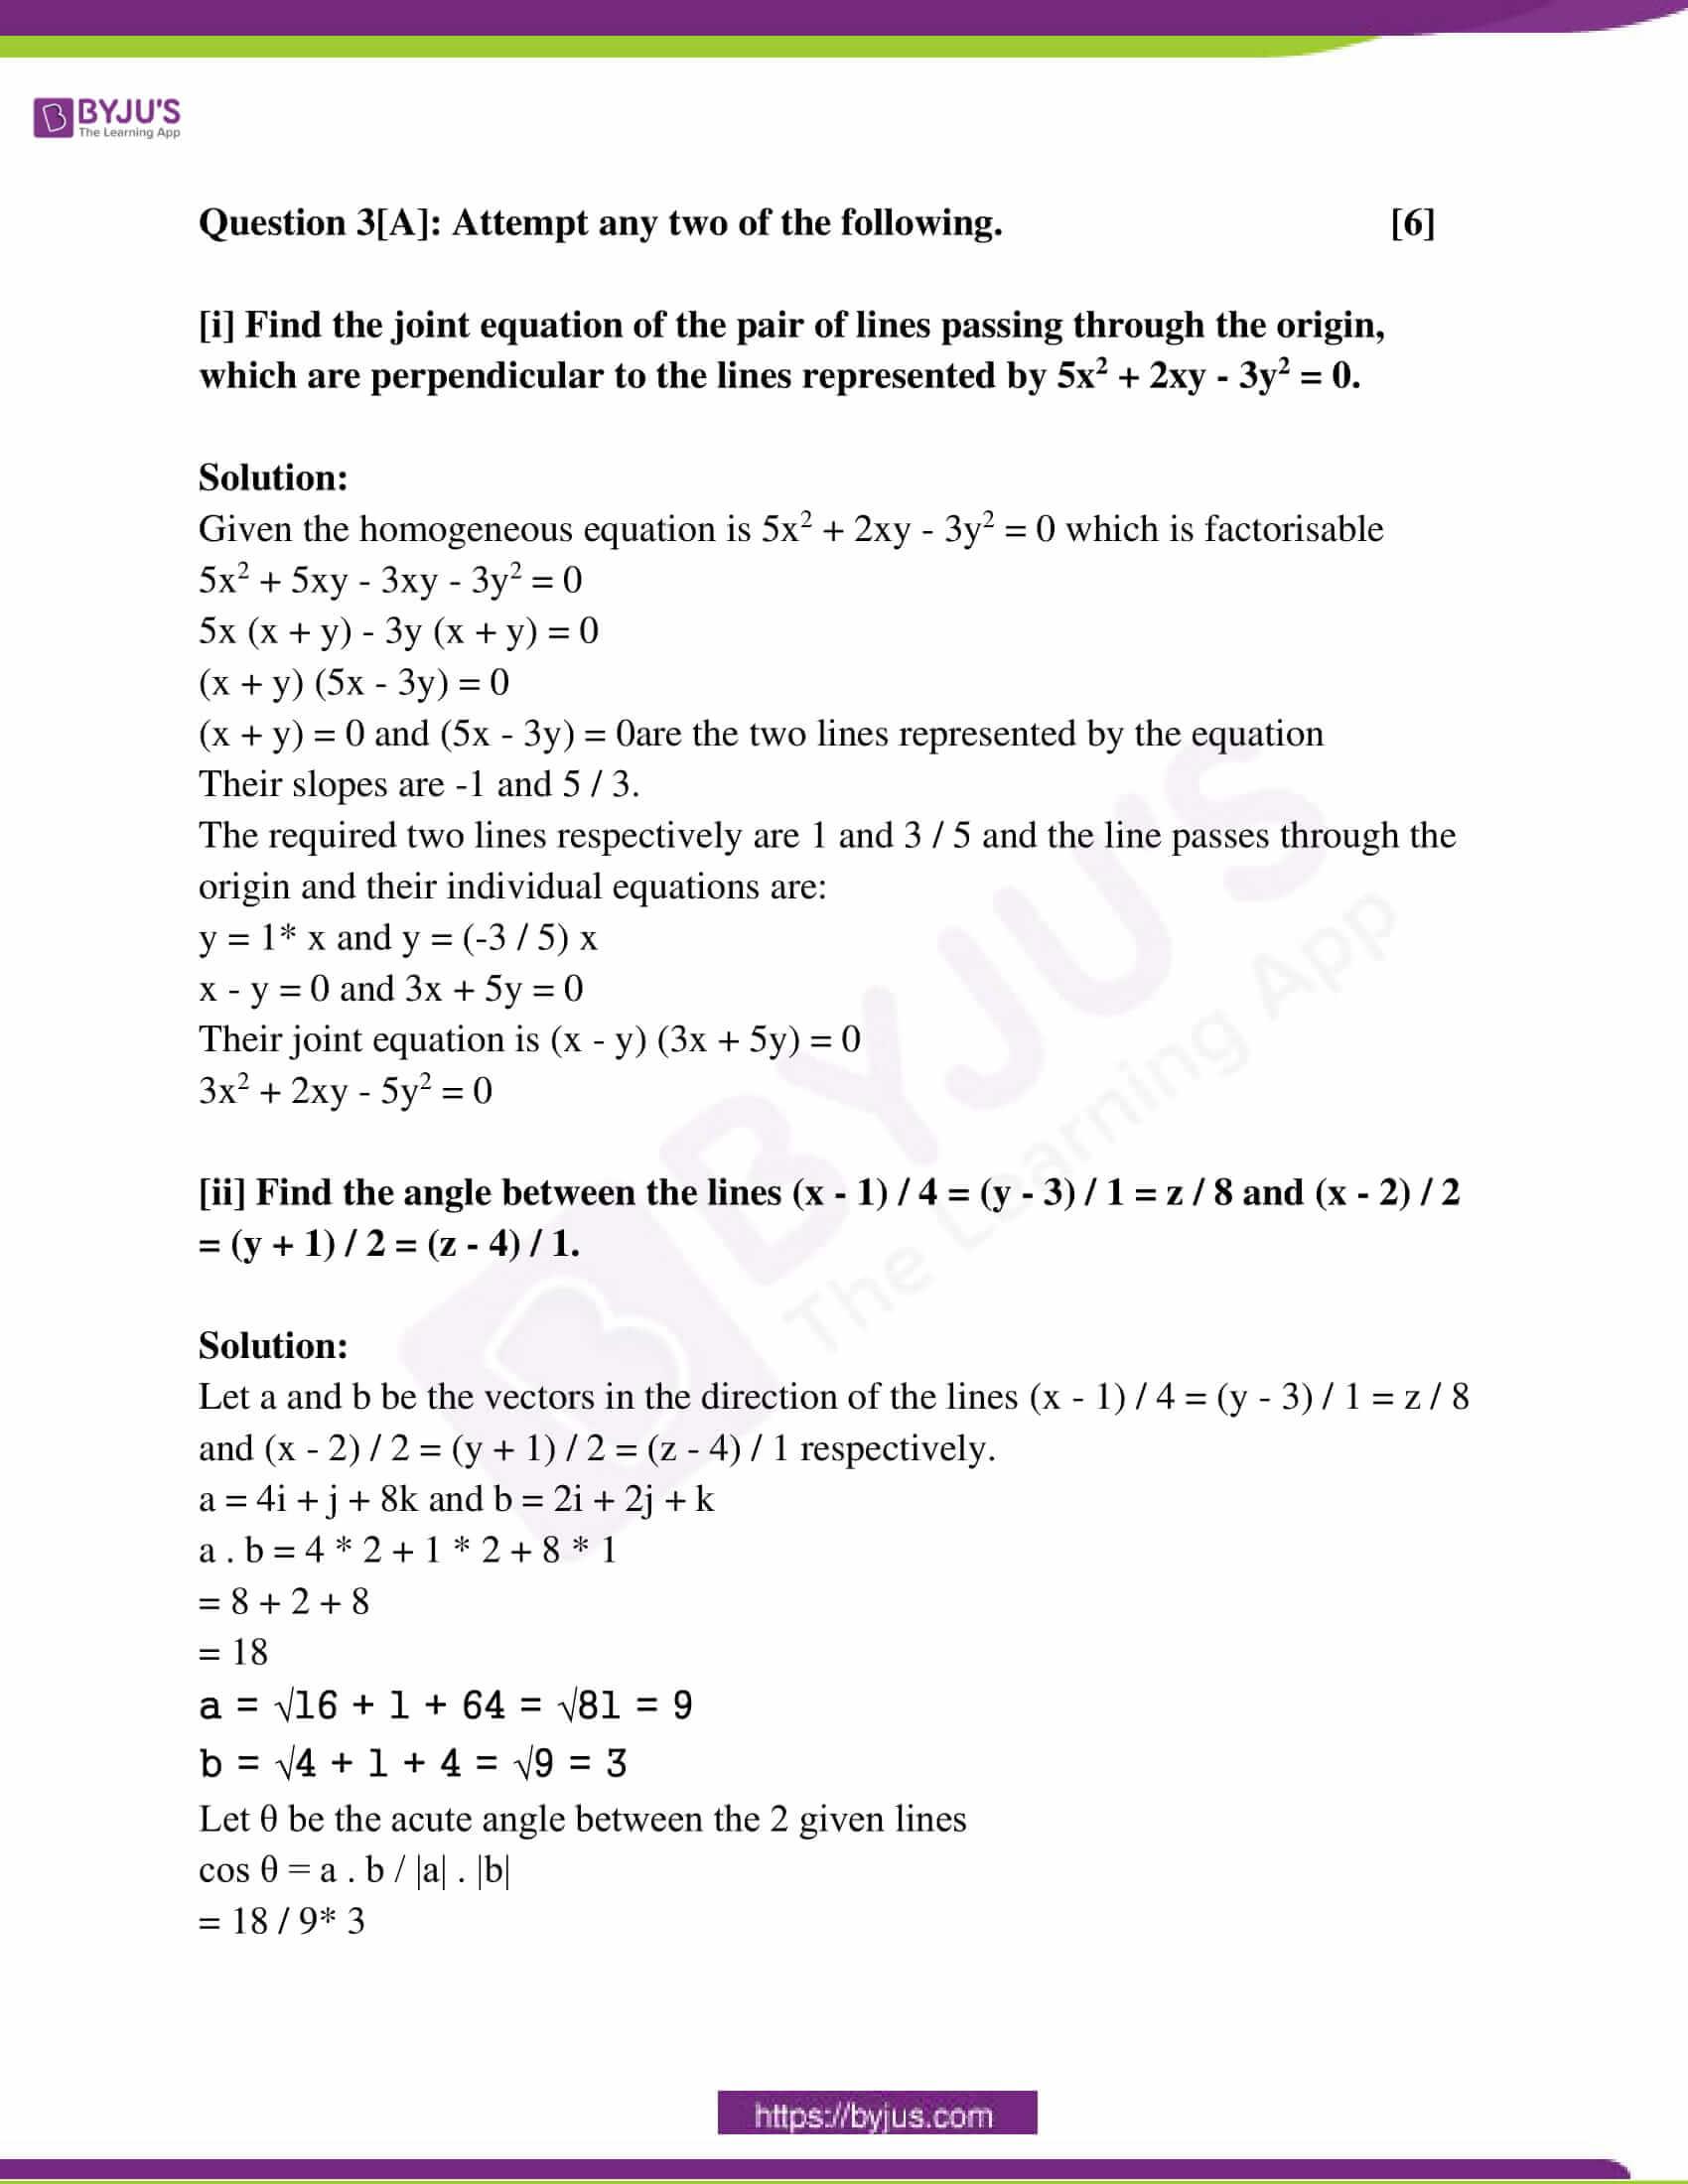 maharashtra class 12 exam question paper solutions march 2018 11